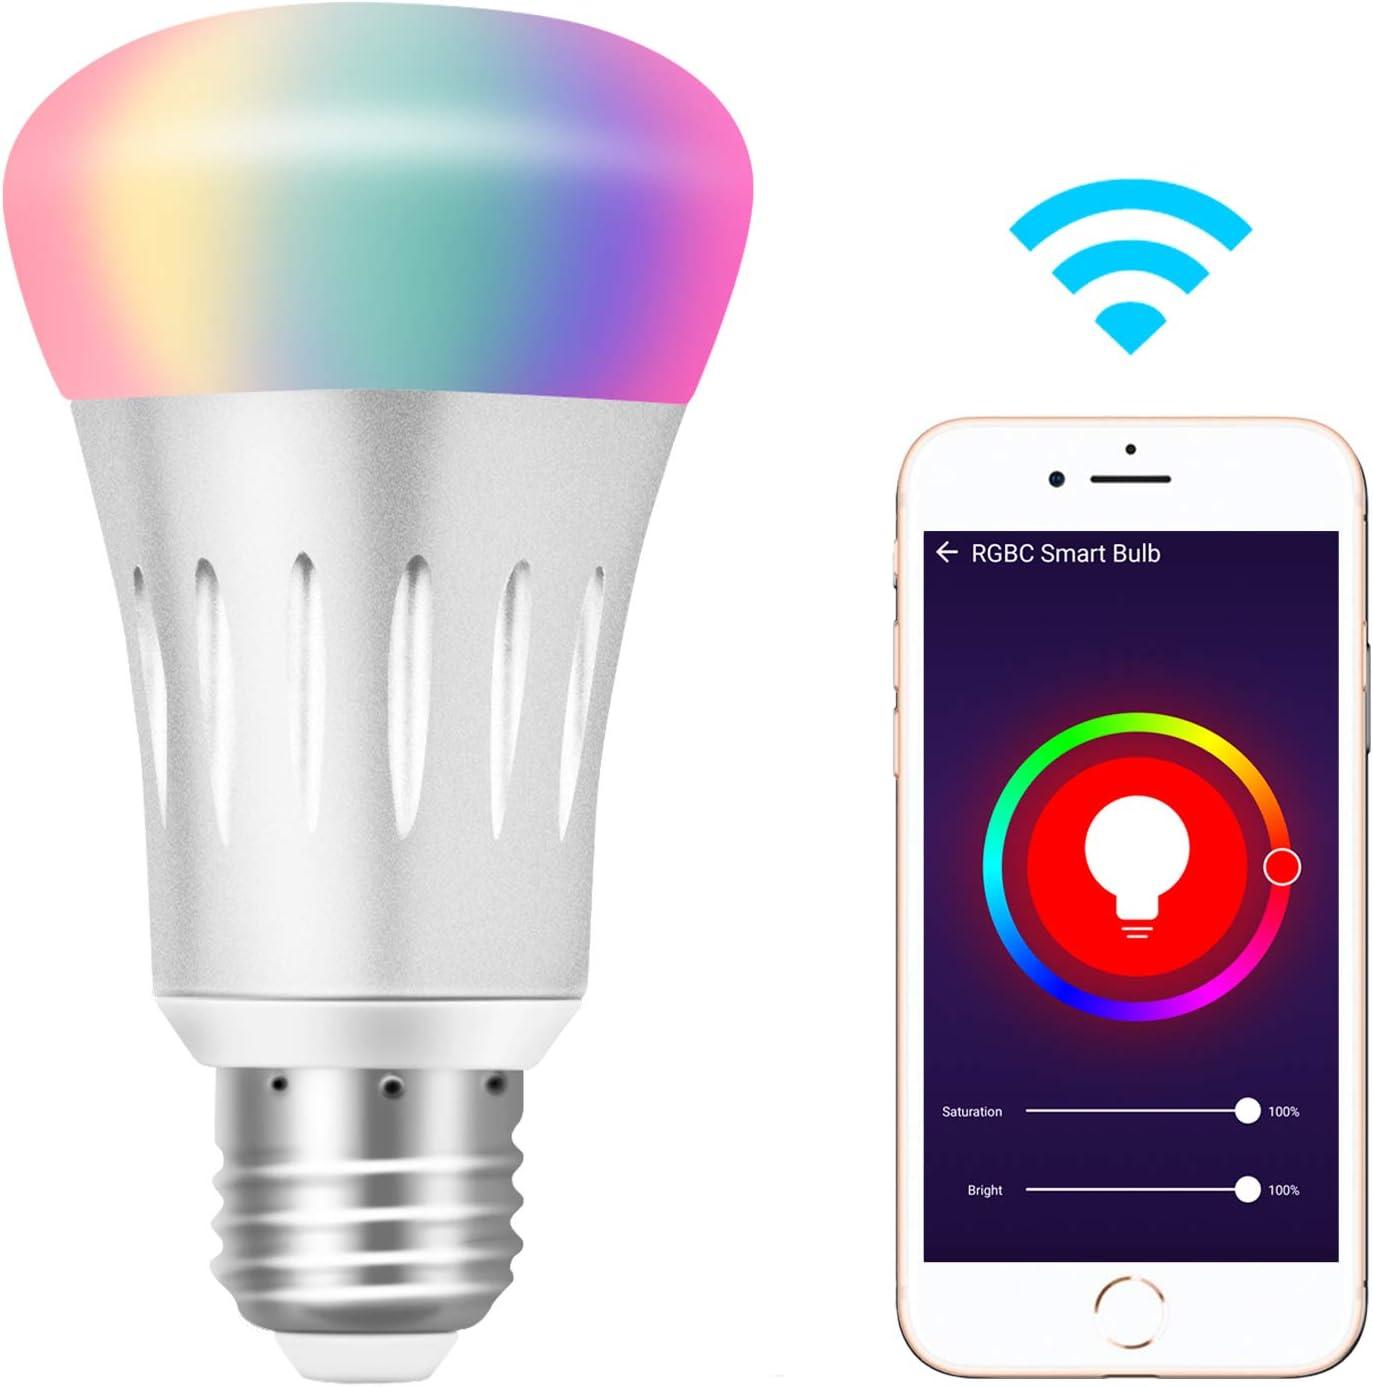 Bombilla Inteligente de Lámpara Alexa Wlan LED [E27, 7W] RGB Luz Regulable, Control de Voz con Alexa y Google Home, Lámpara Wifi con App Control Remoto Función del Temporizador Cambio de Color: